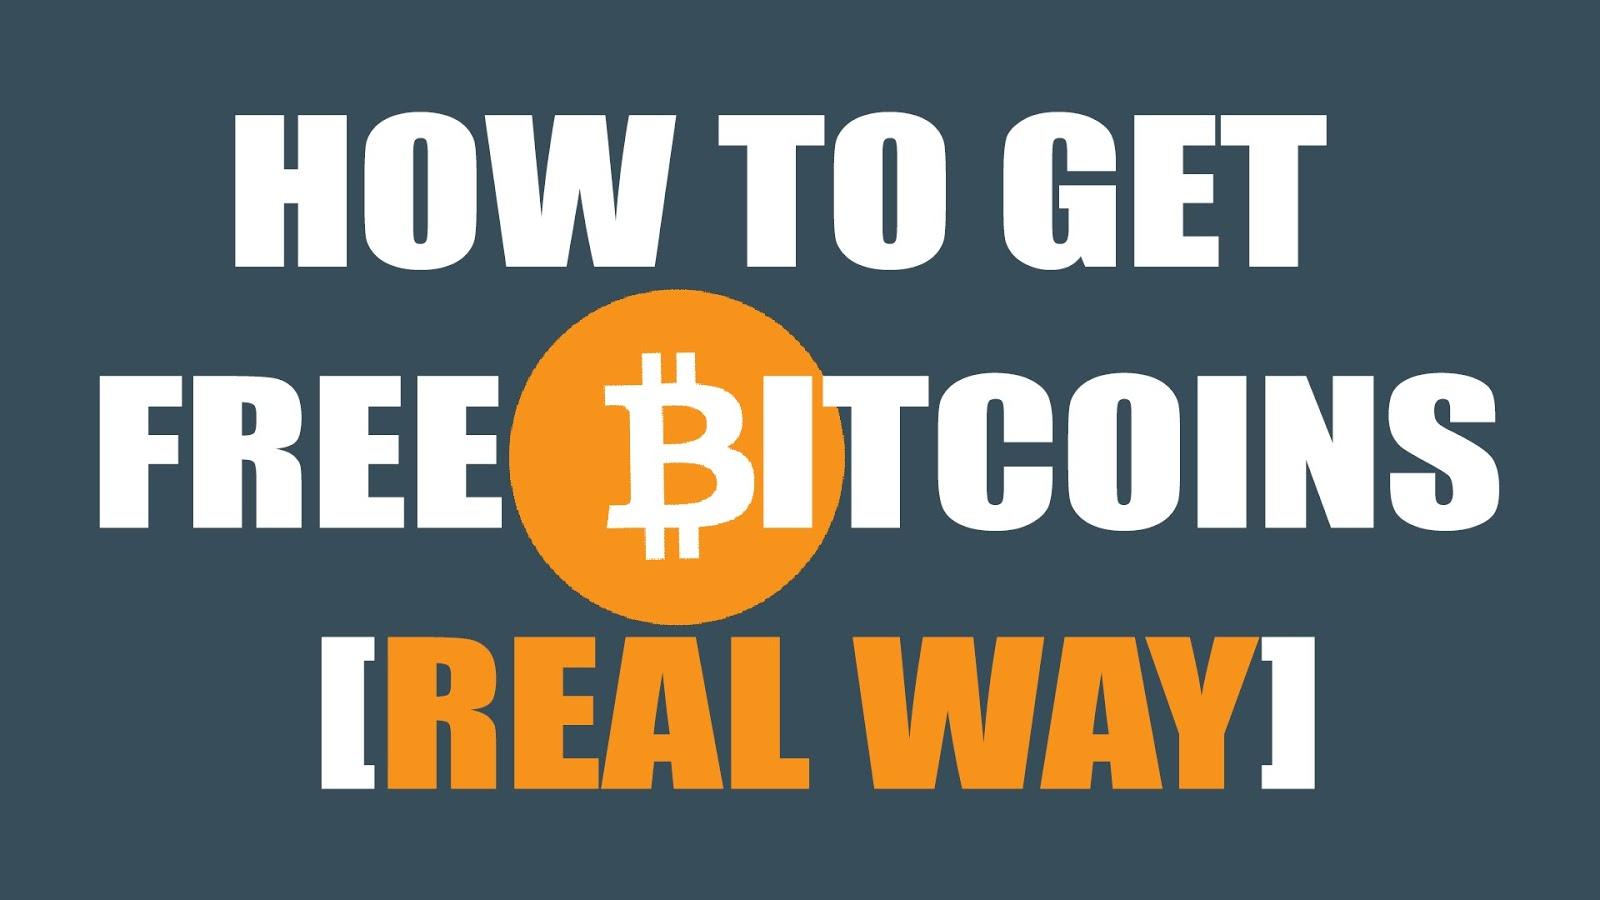 Quick free bitcoins